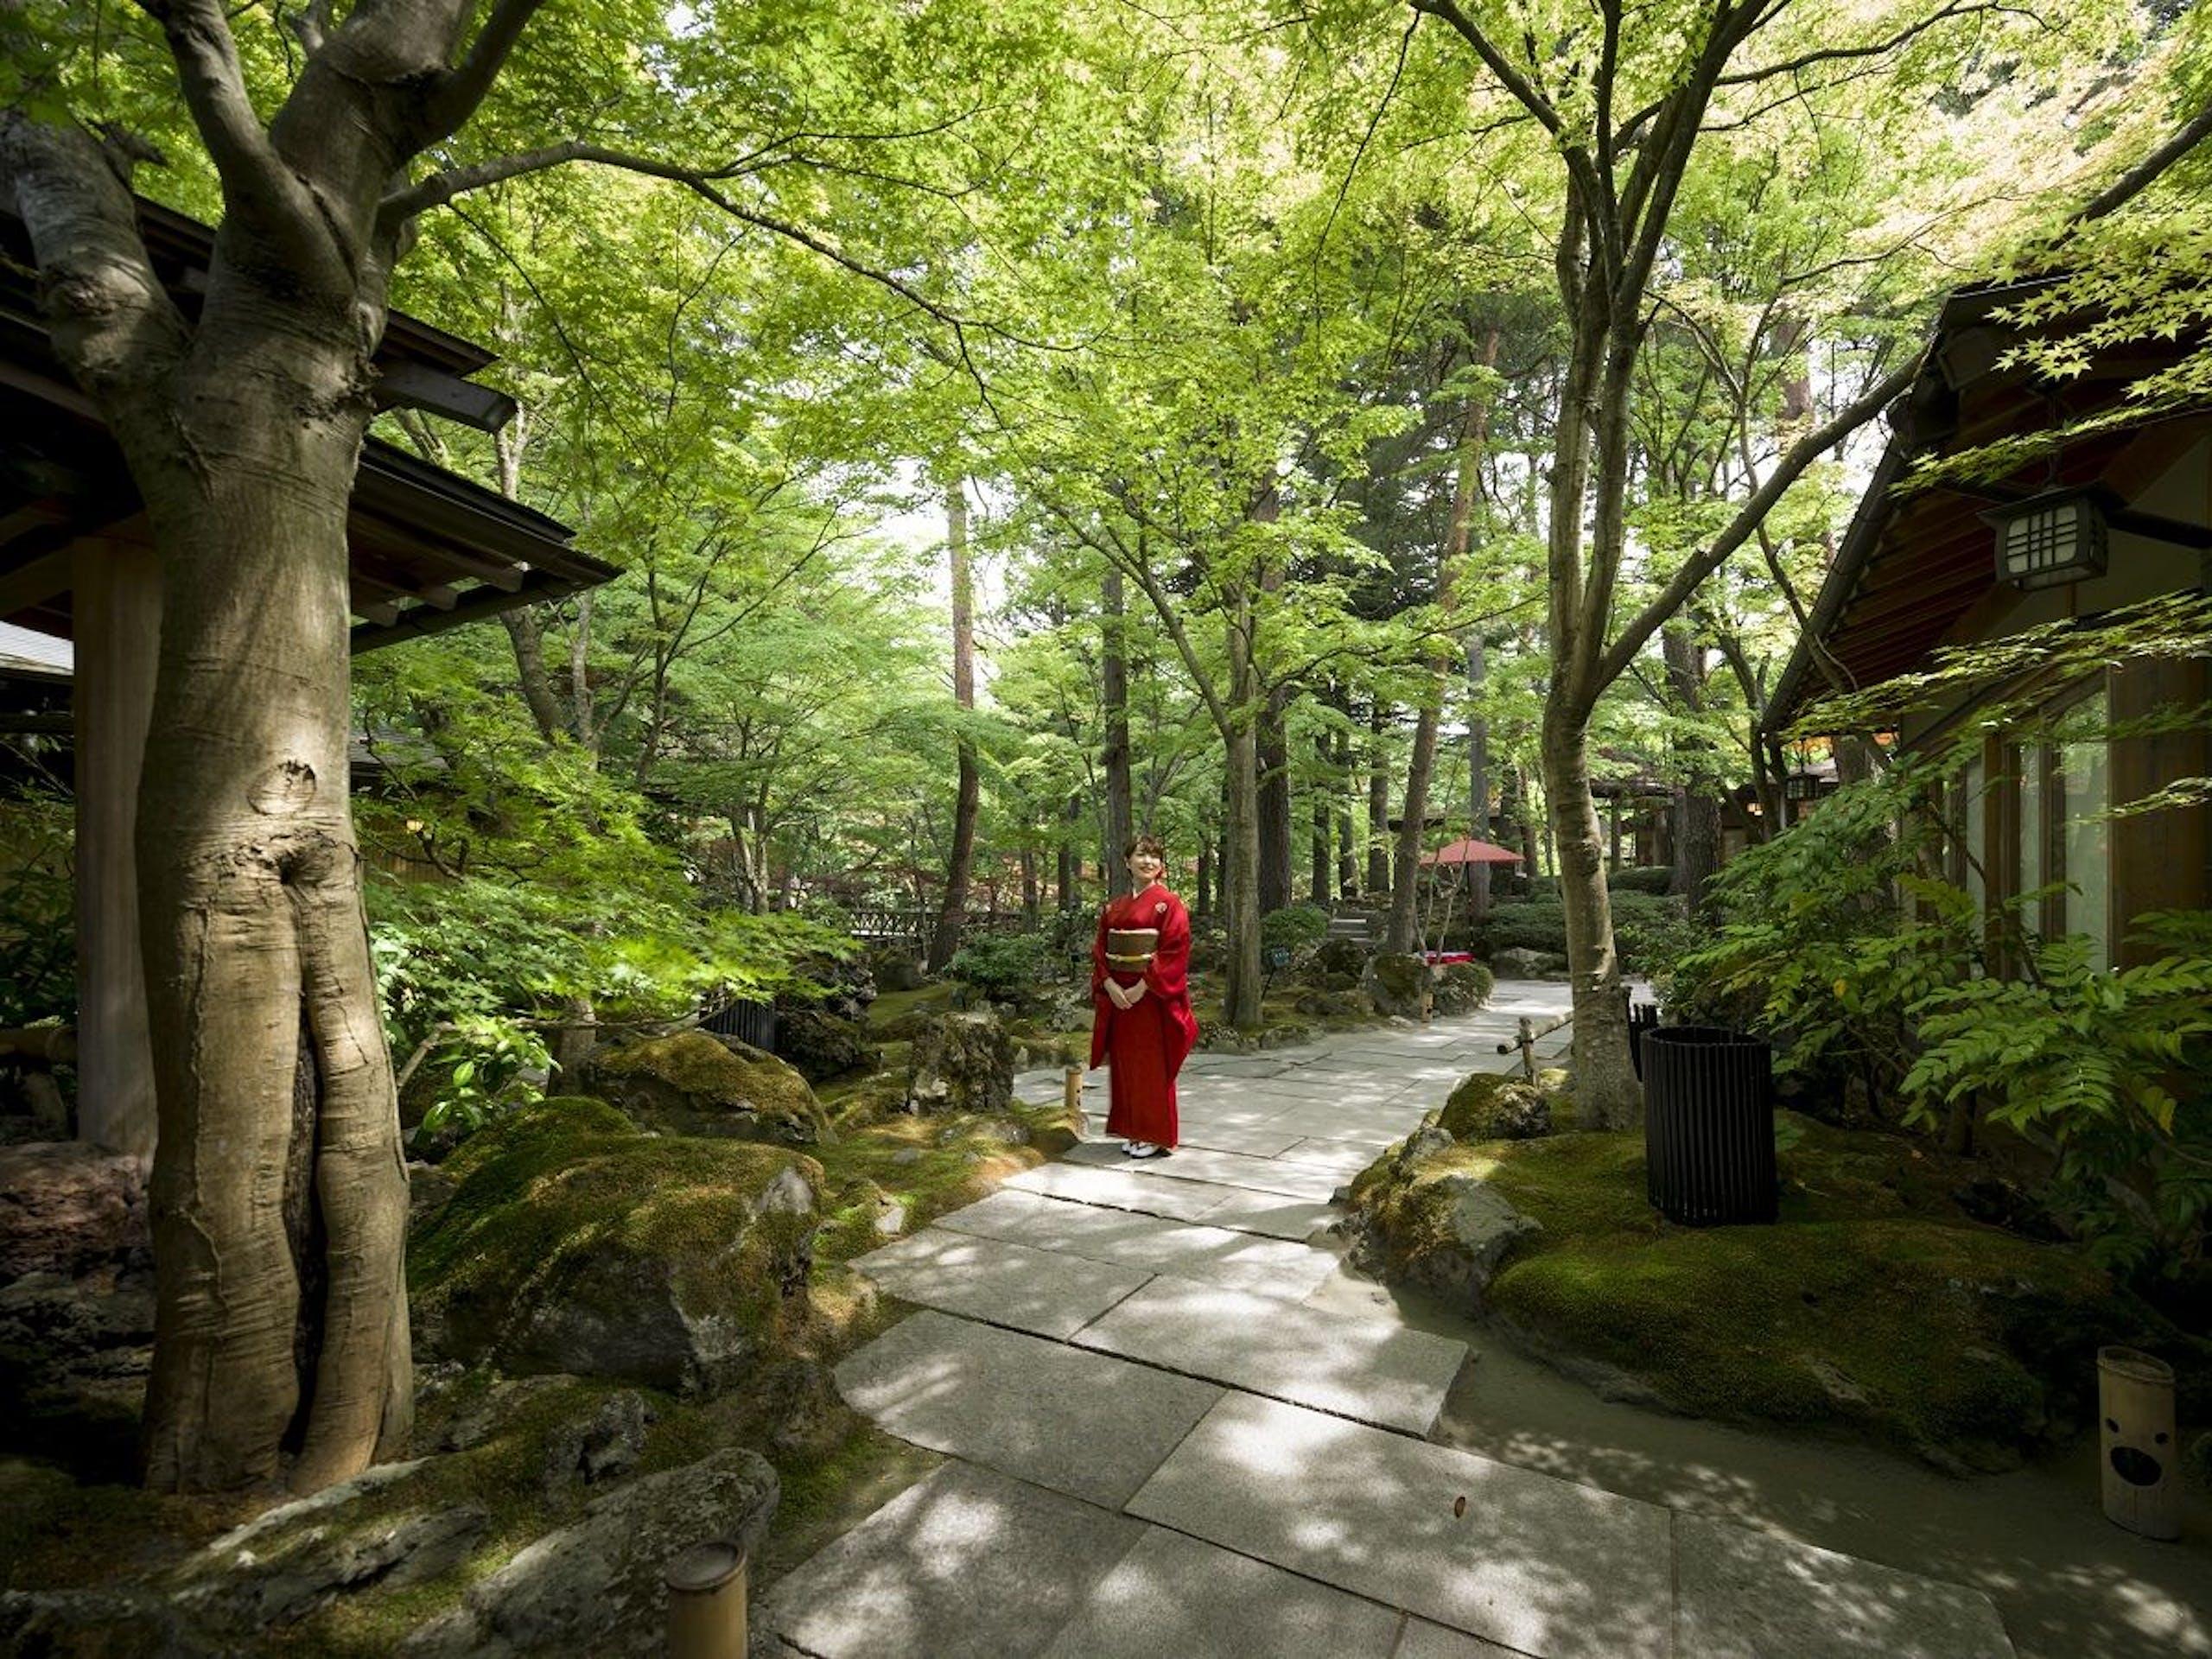 庭園と感動の宿 富士山温泉 ホテル鐘山苑(山梨県富士吉田市)2